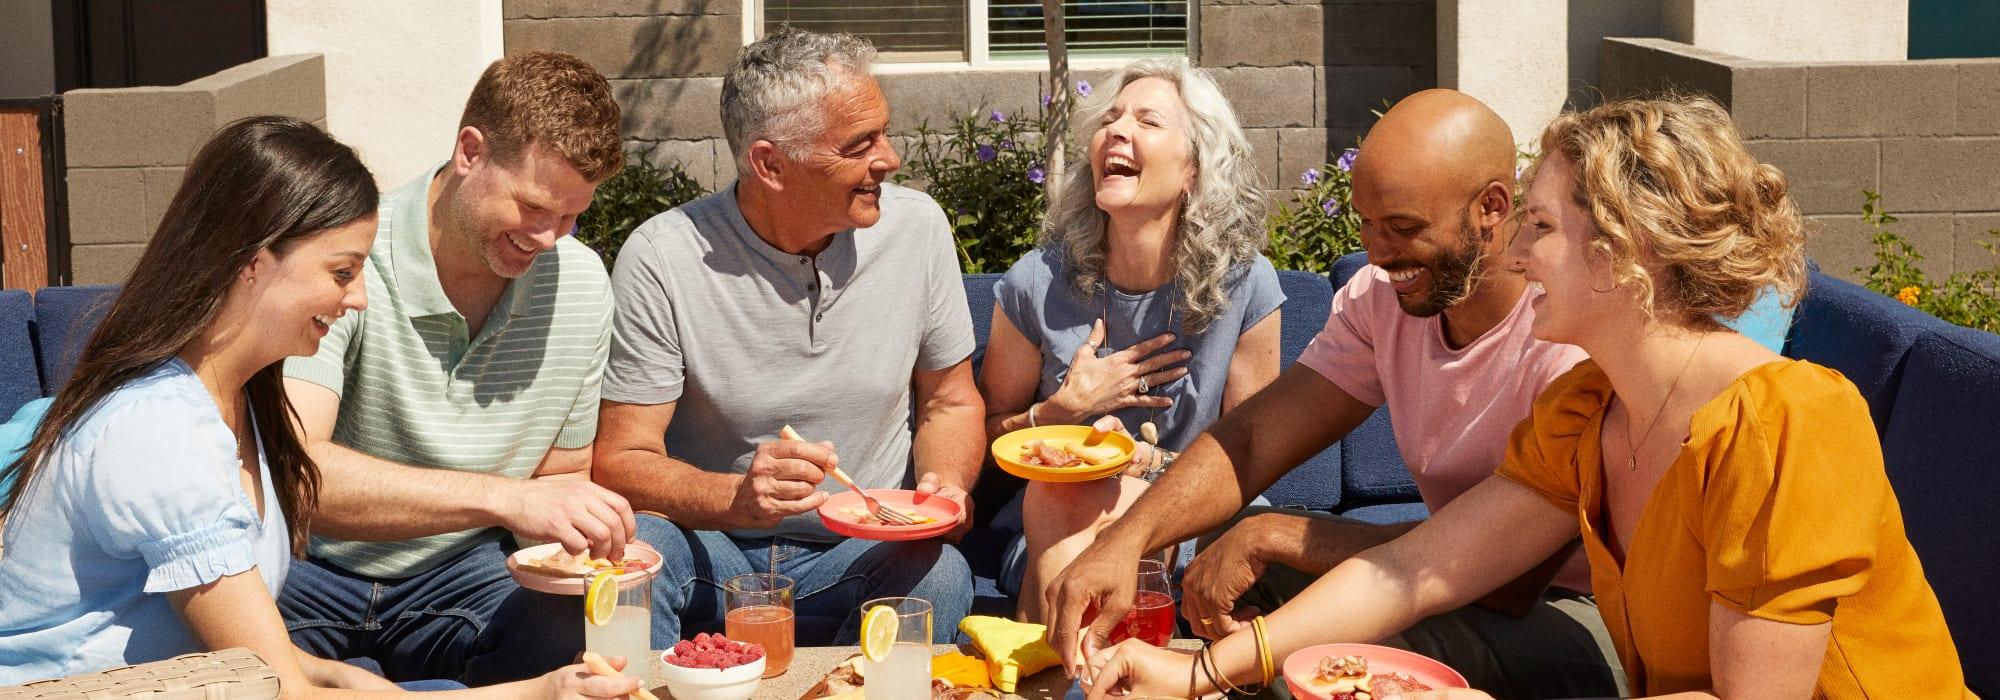 Friends enjoying food at Las Casas at Windrose in Litchfield Park, Arizona